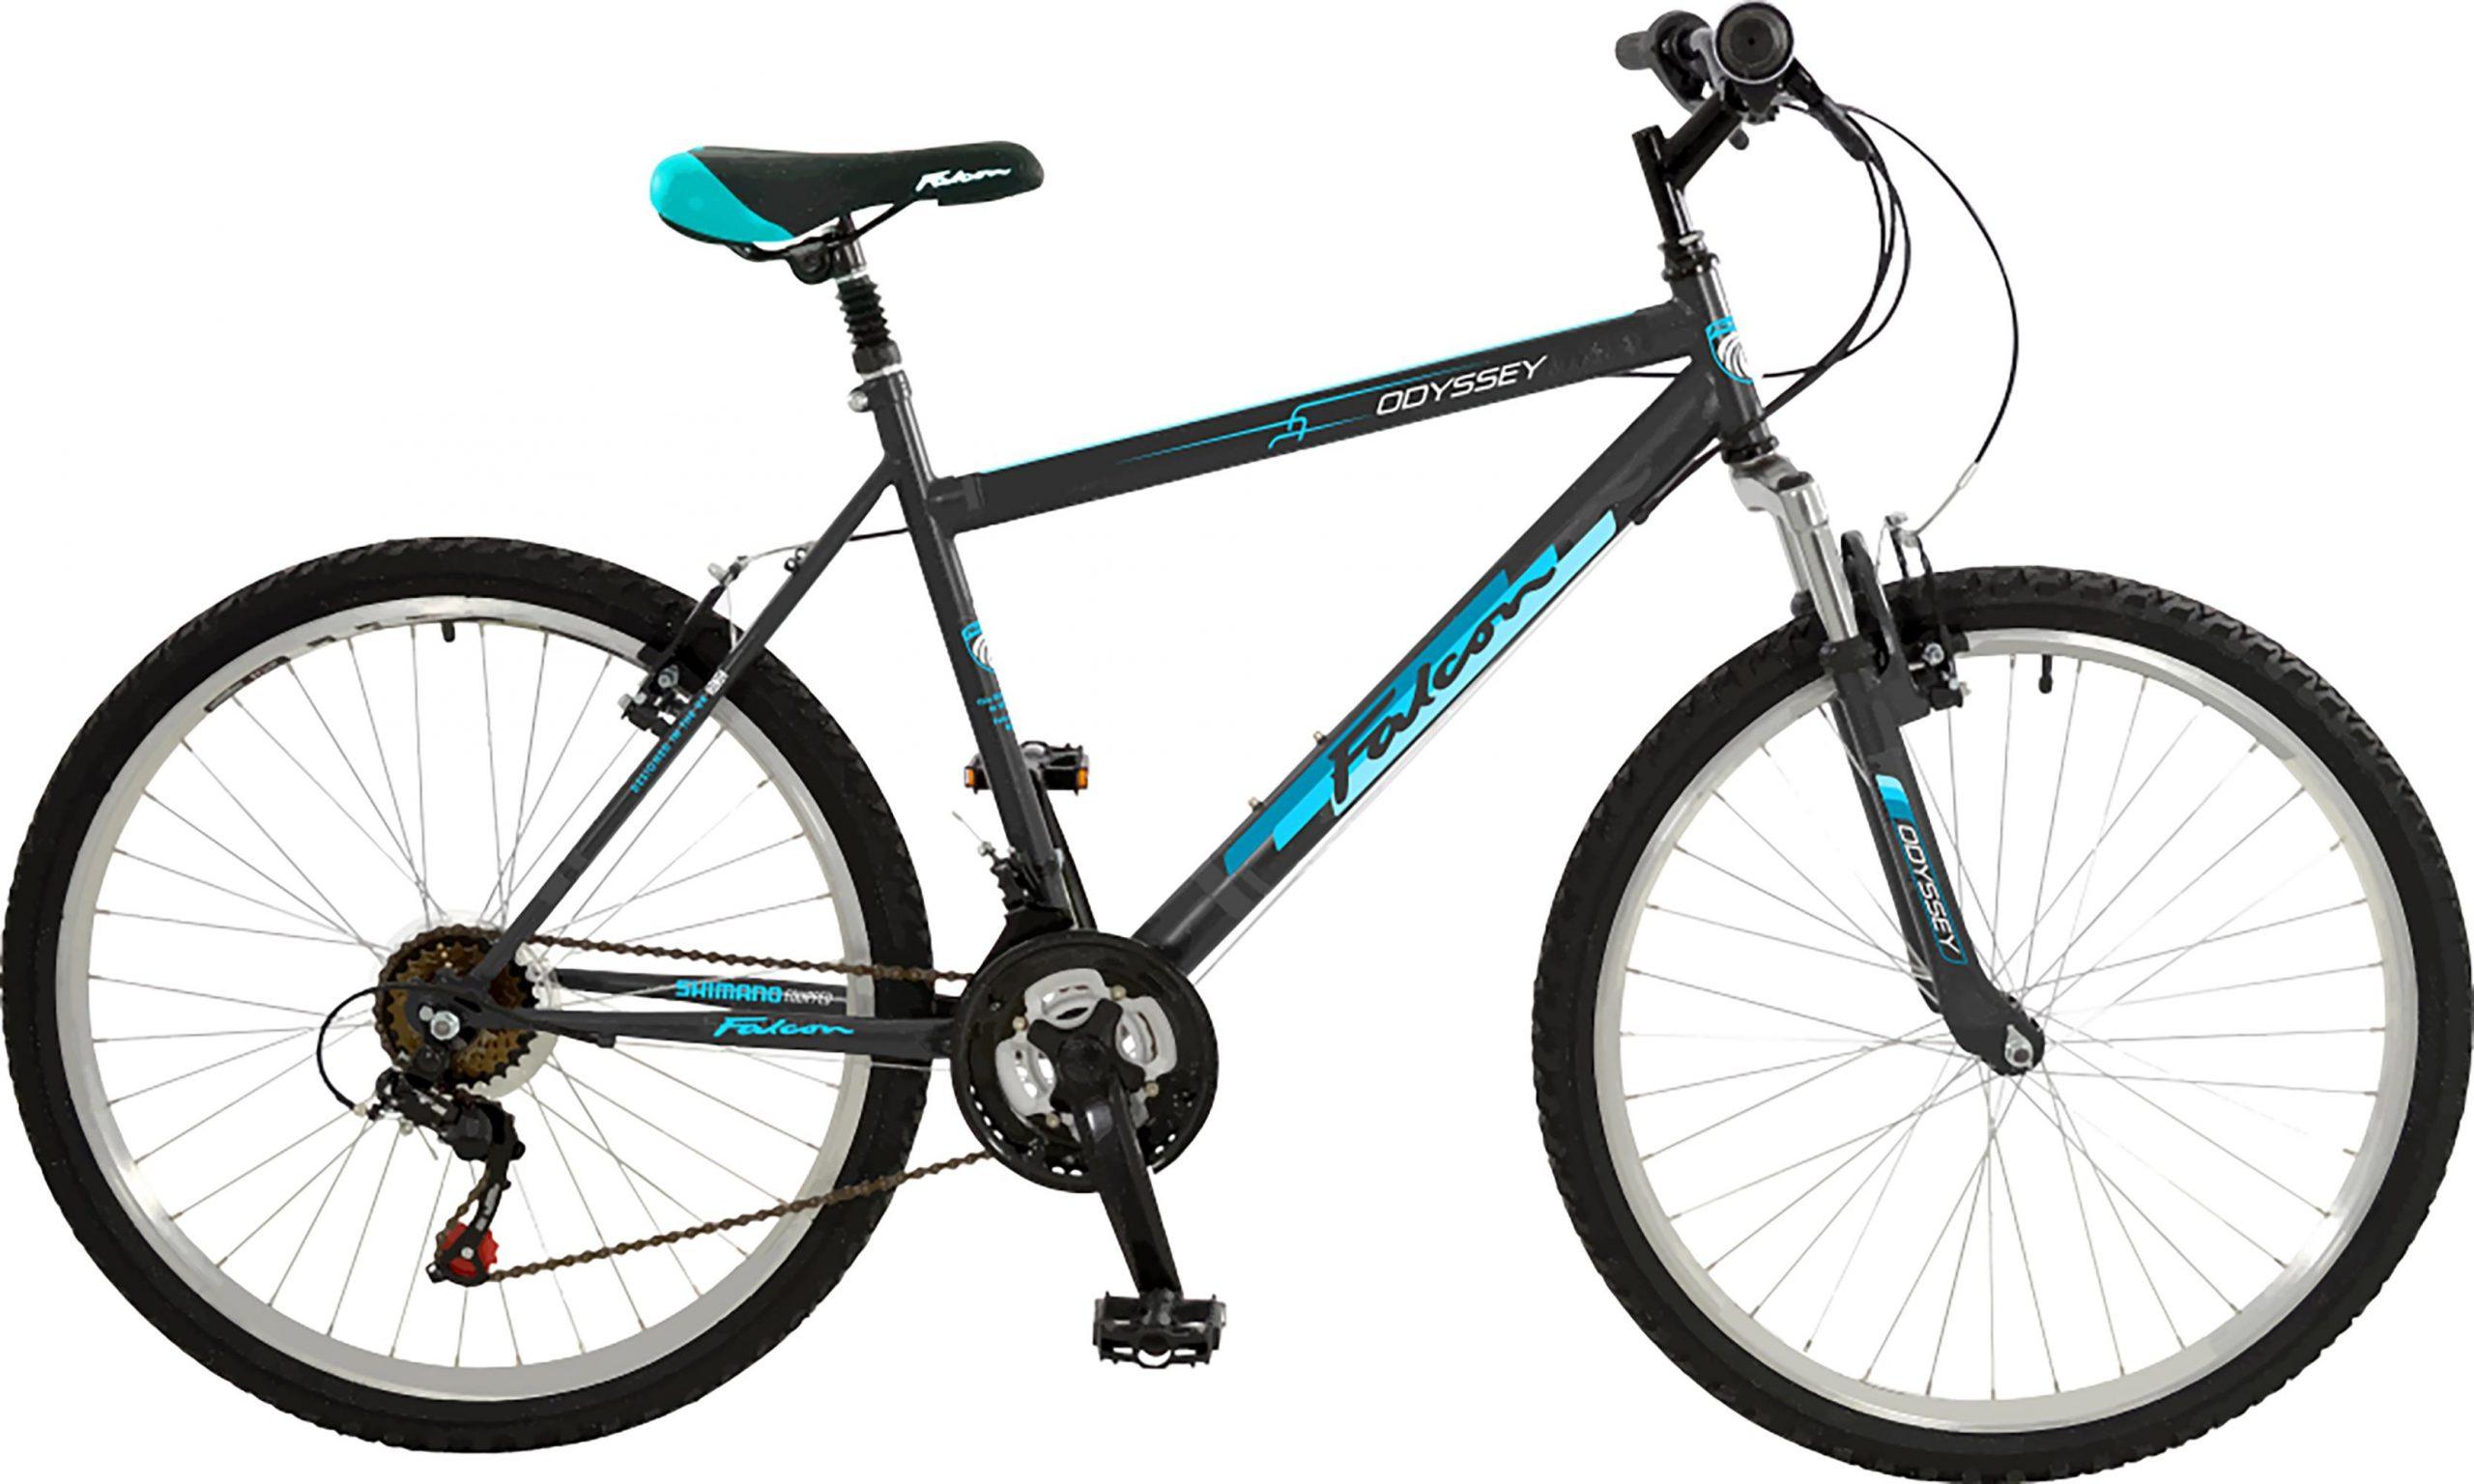 Falcon Odyssey Mens 19 Inch Mountain Bike